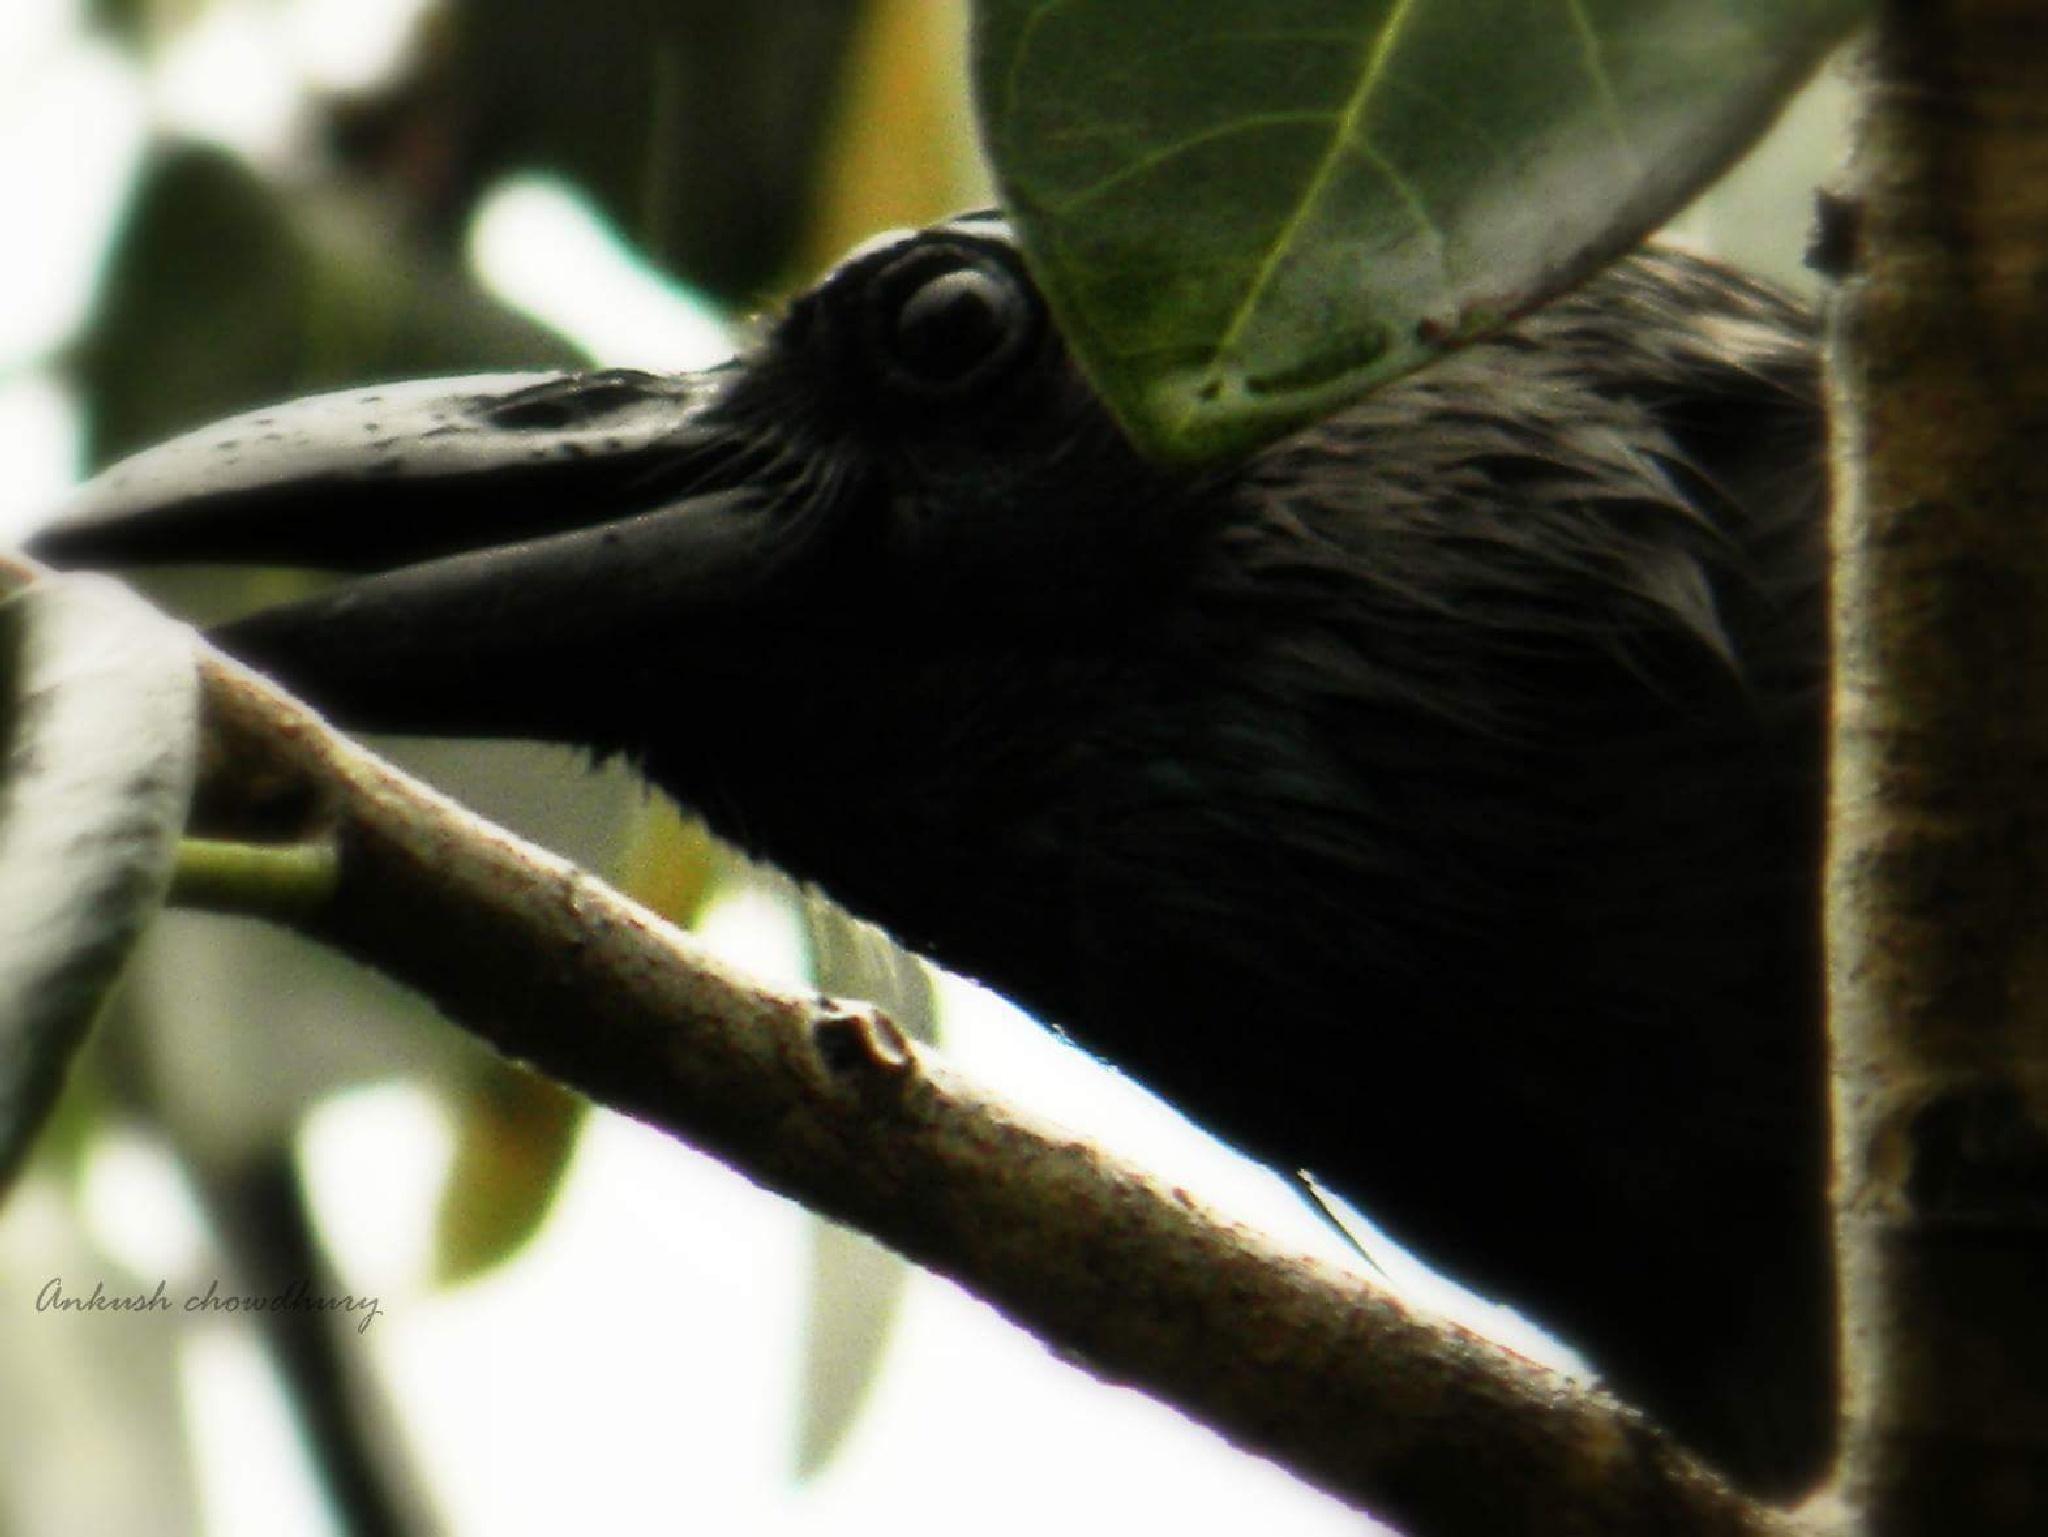 Even crows catch eyes in rain... by Subhankar Chowdhury Ankush